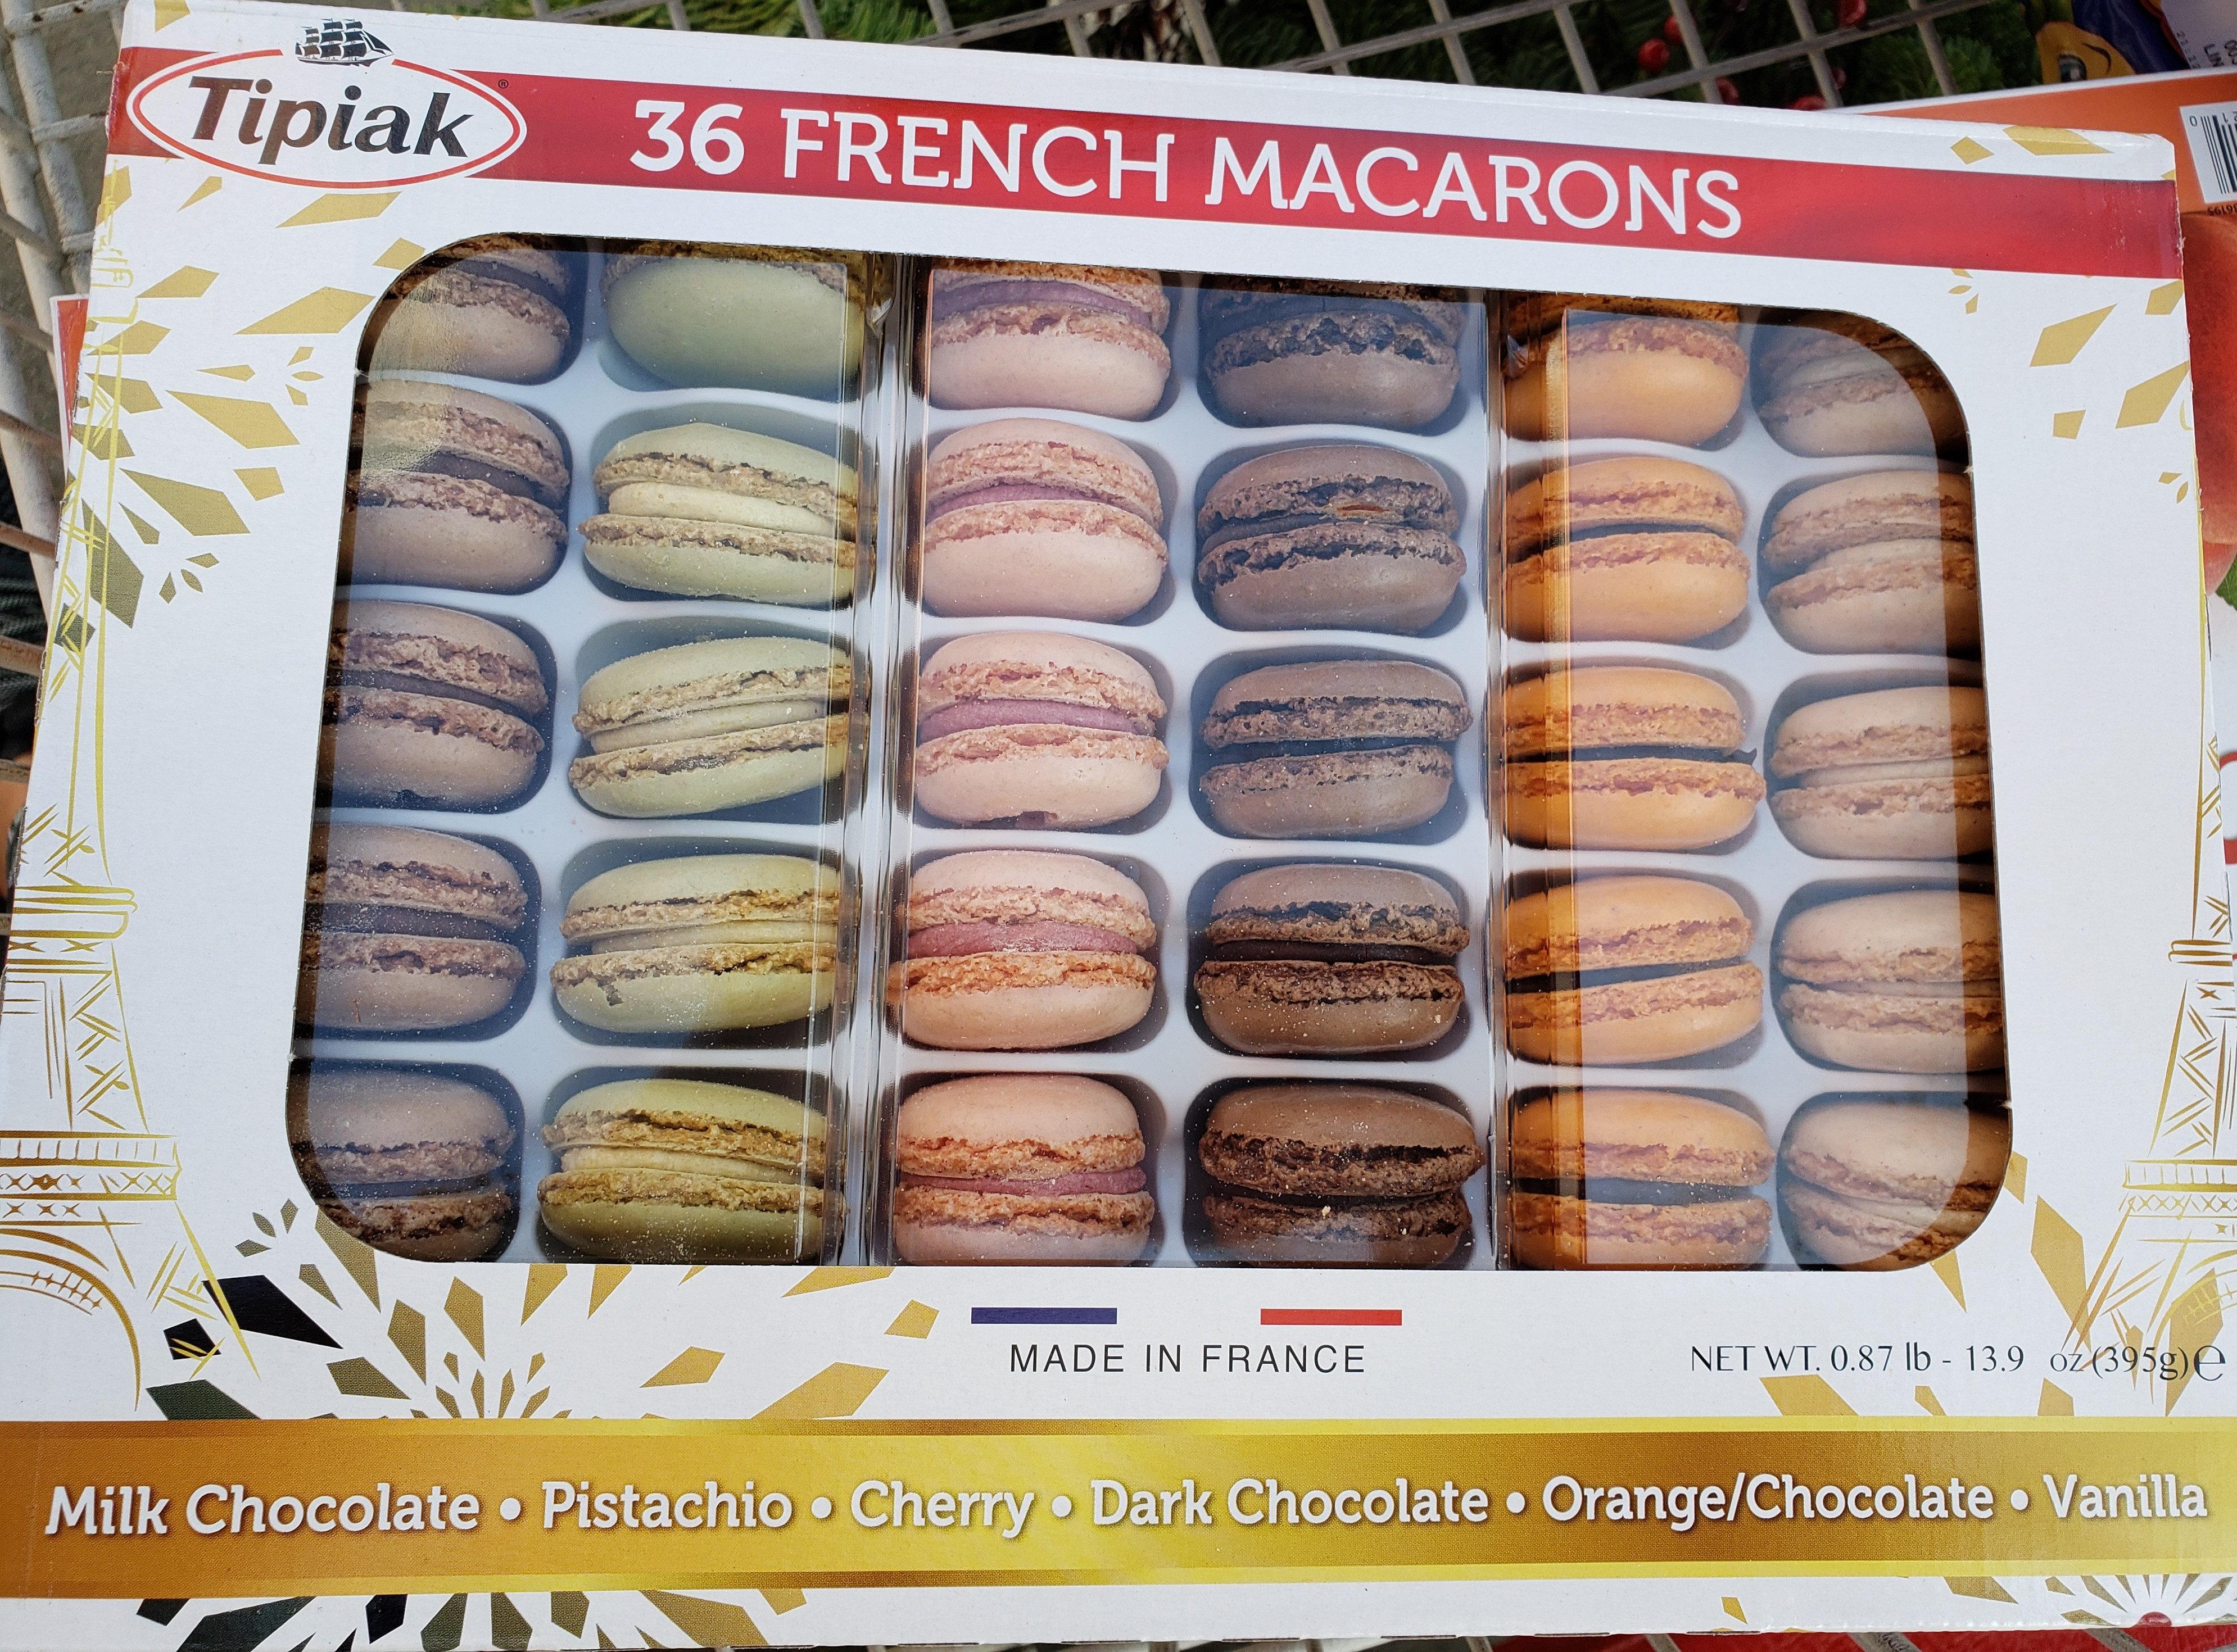 Tipiak 36 French Macarons - Product